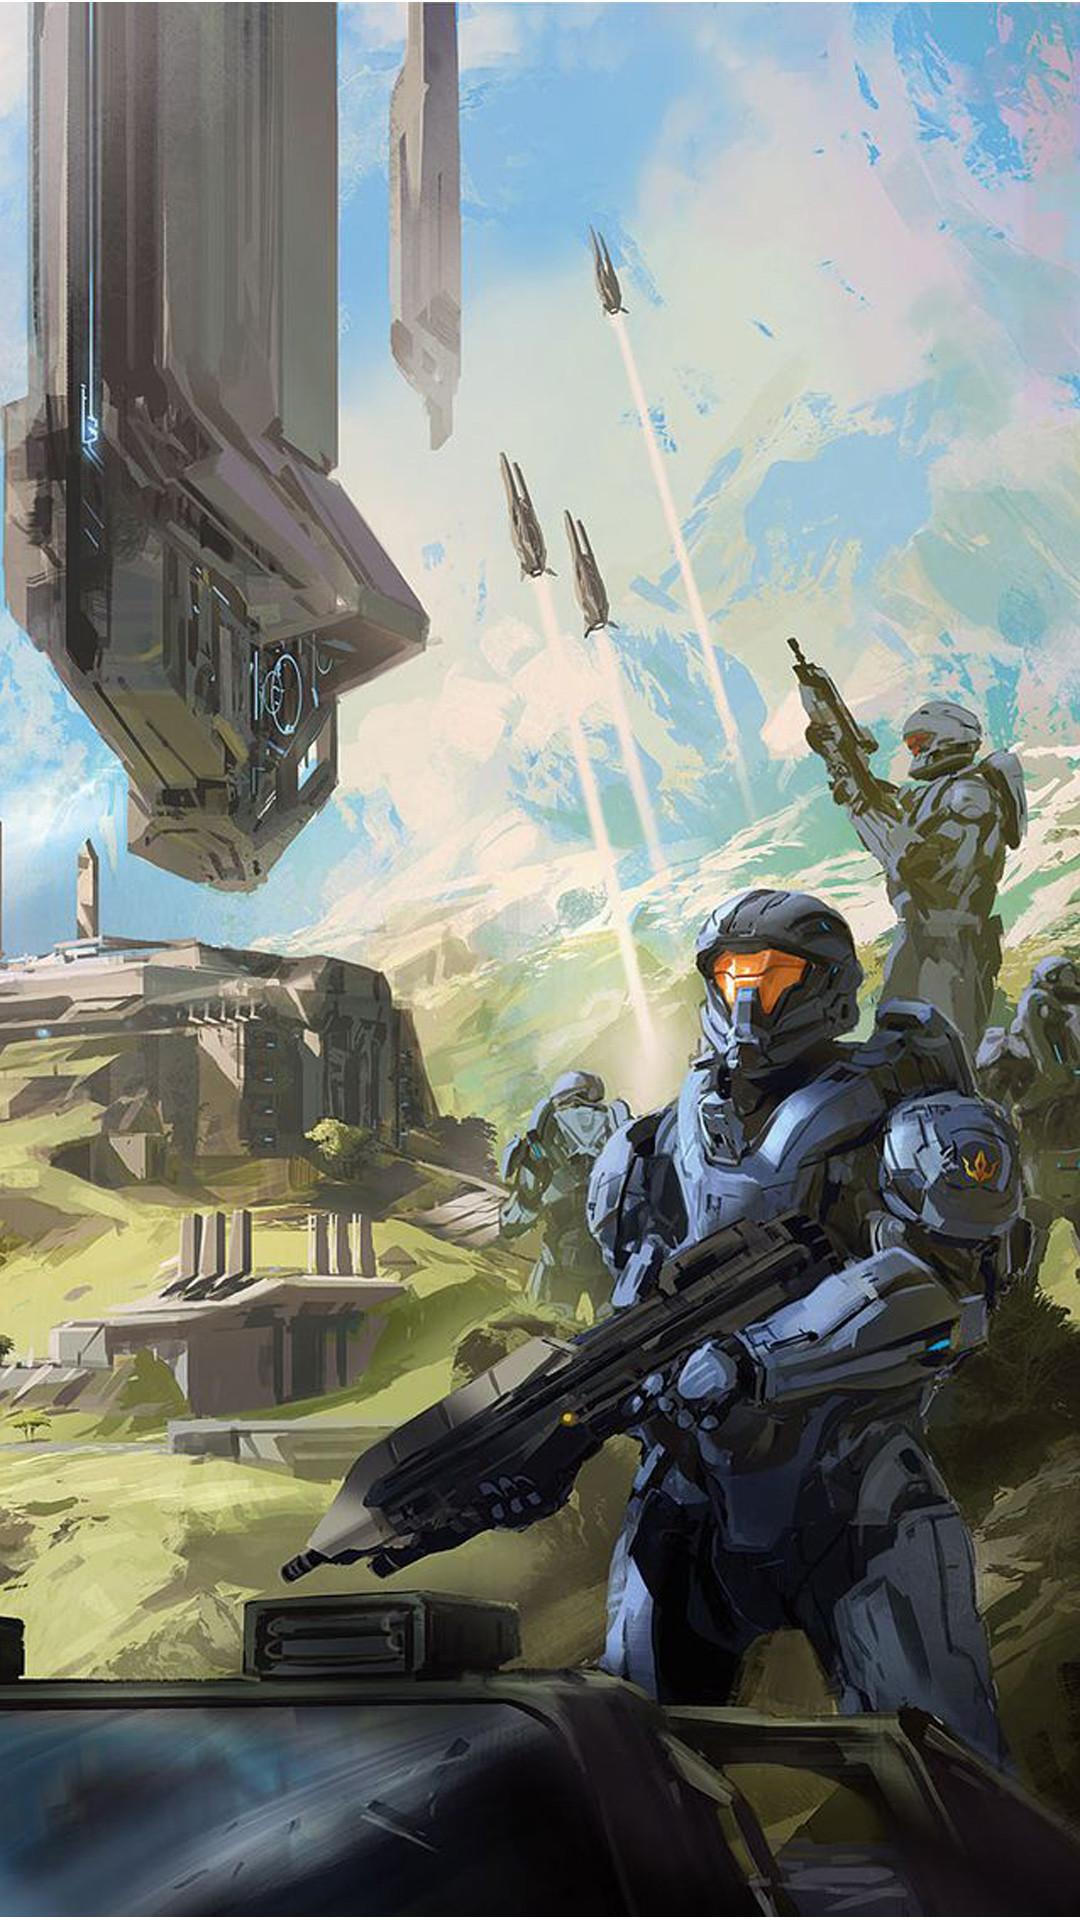 … Halo Wars 2 iphone 5 wallpaper hd